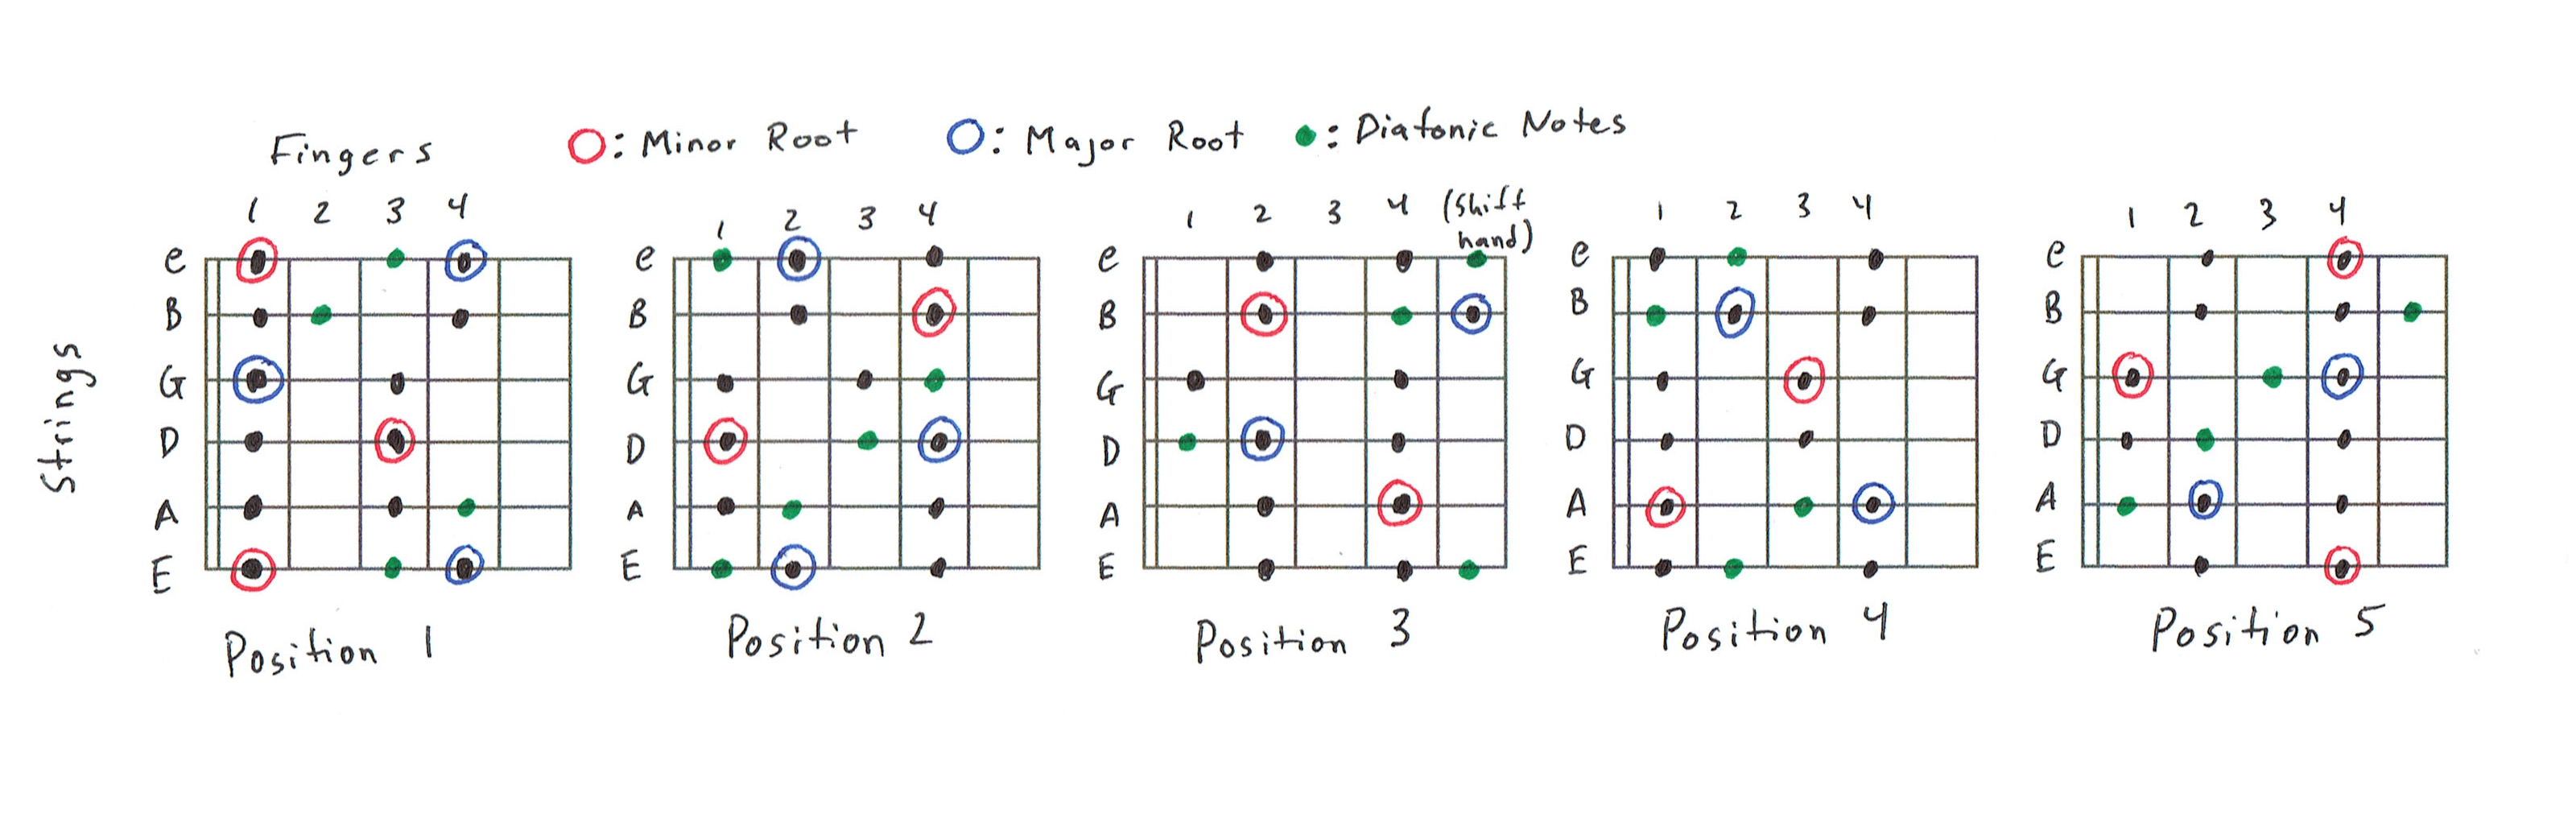 Y66z  Diagram  All 12 Major Scales Guitar Diagram Full